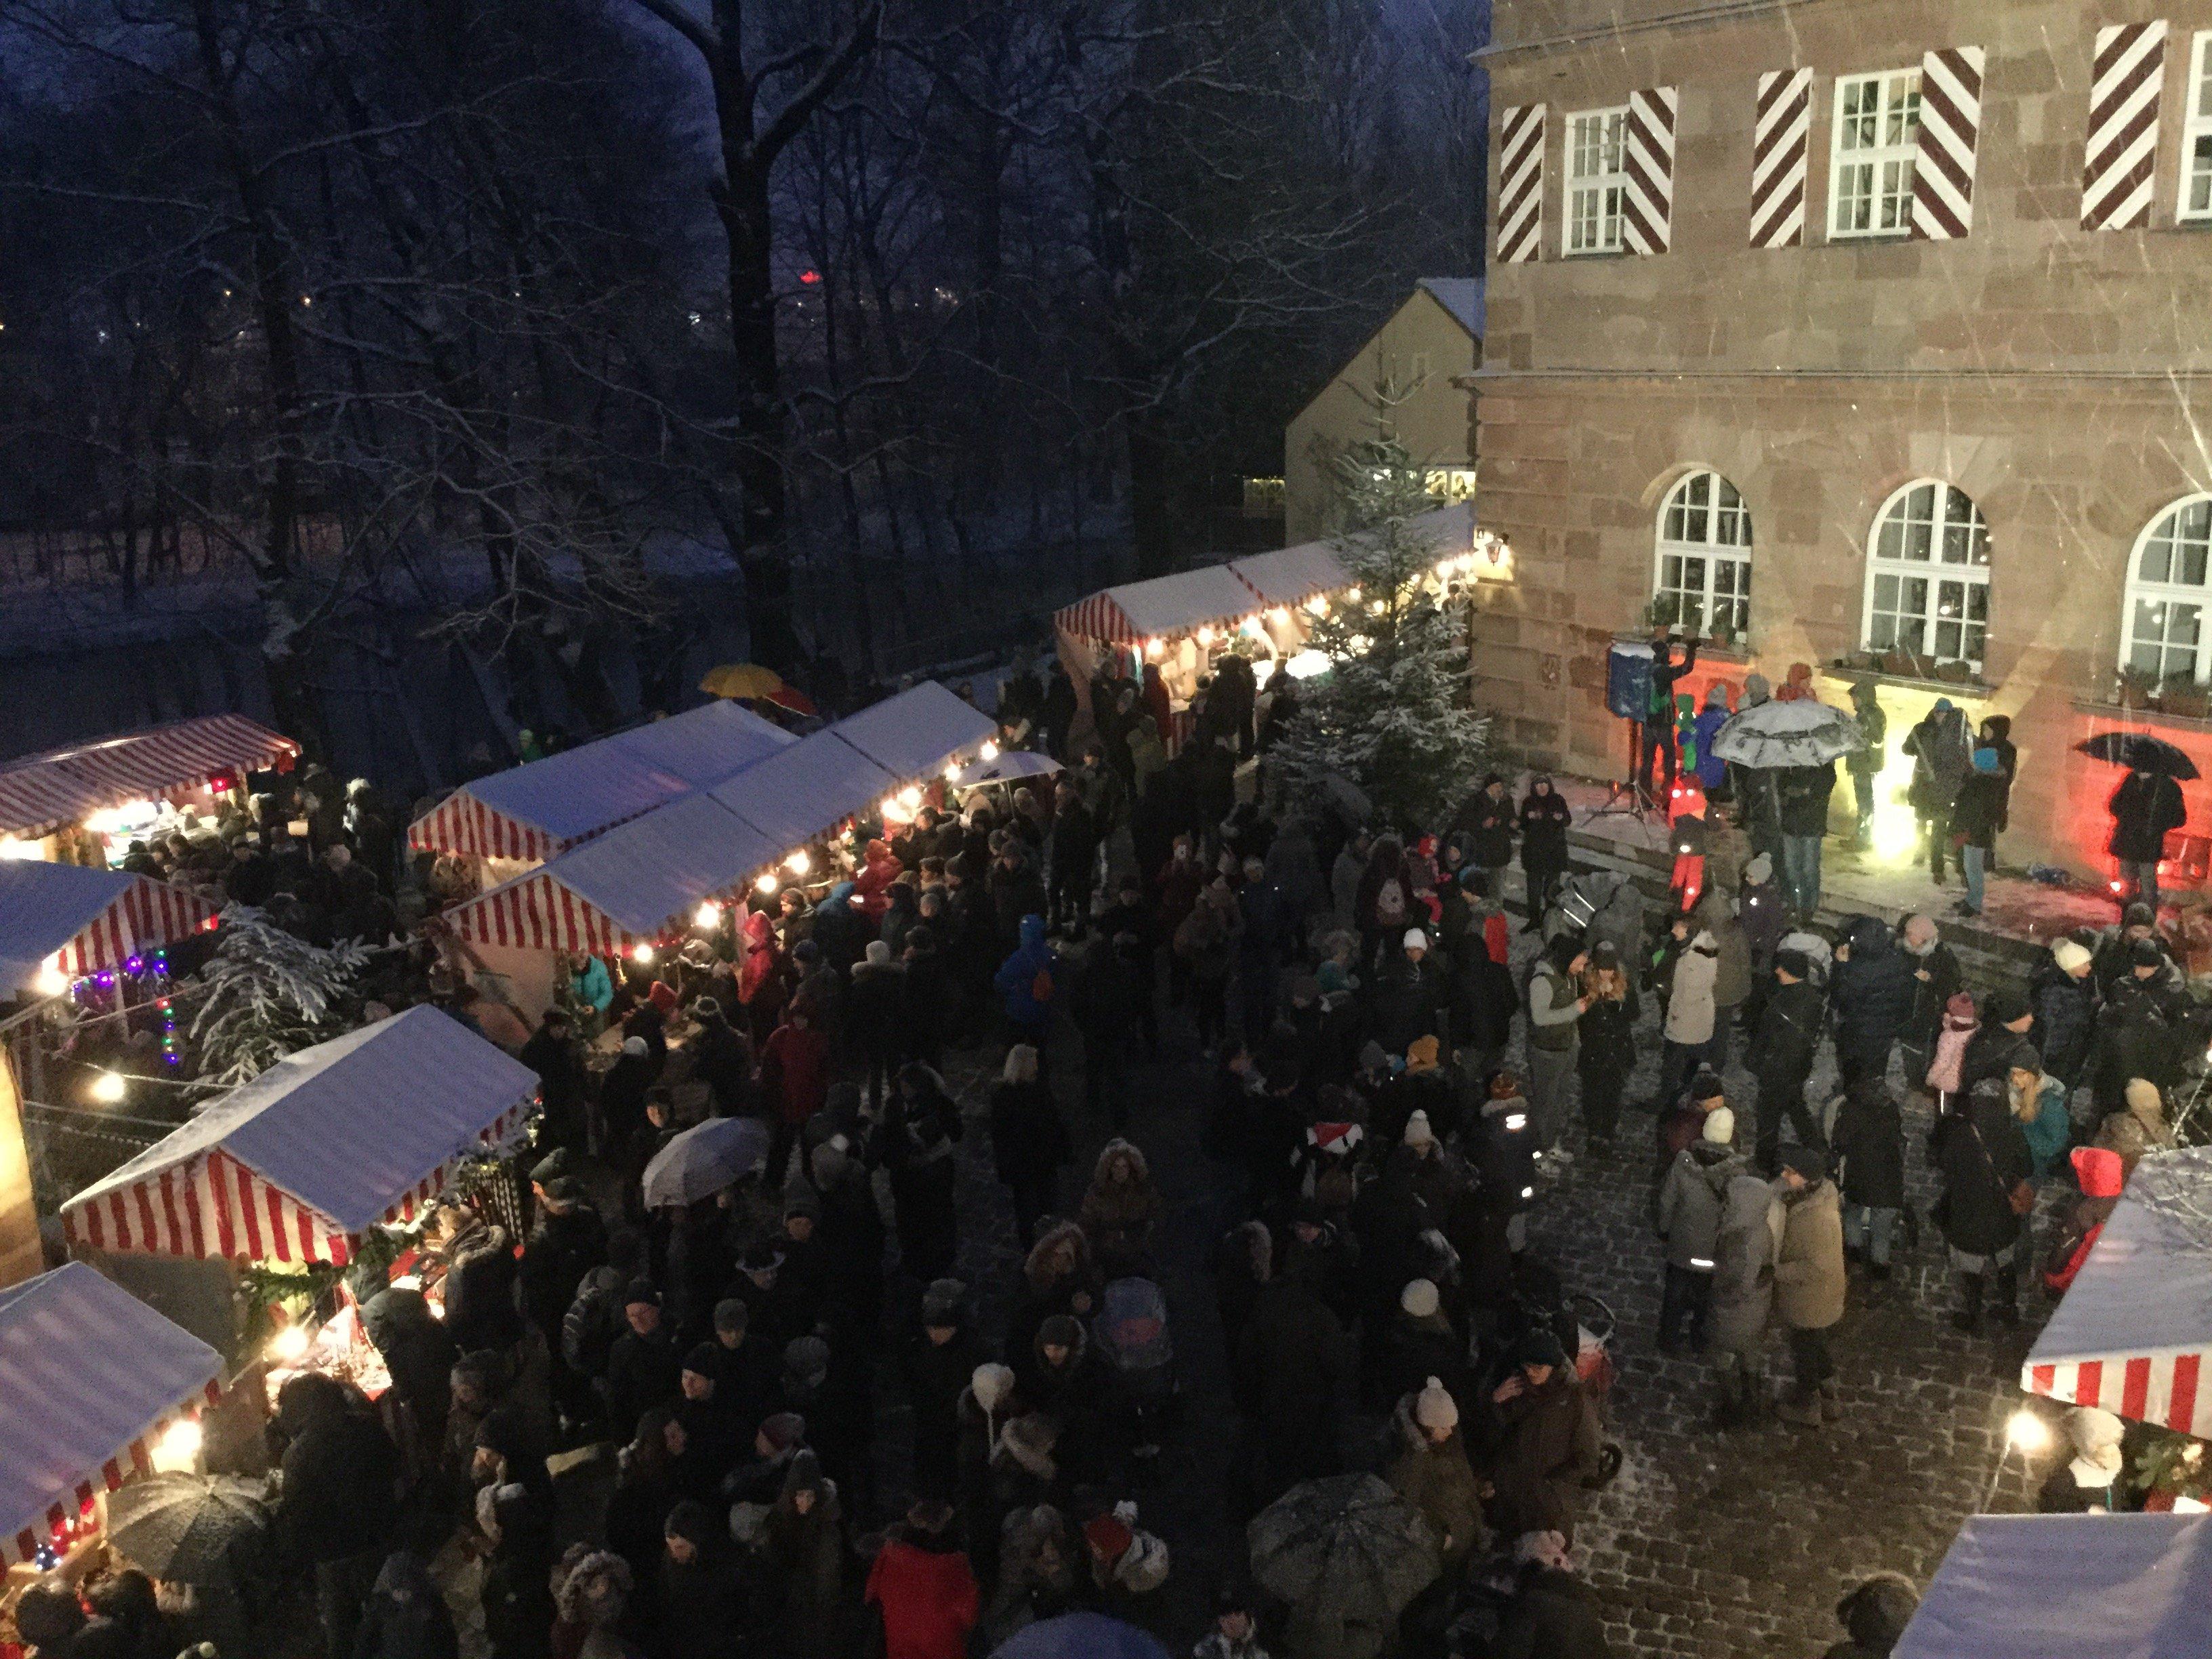 Romantischer Weihnachtsmarkt - © Kulturladen Zeltnerschloss